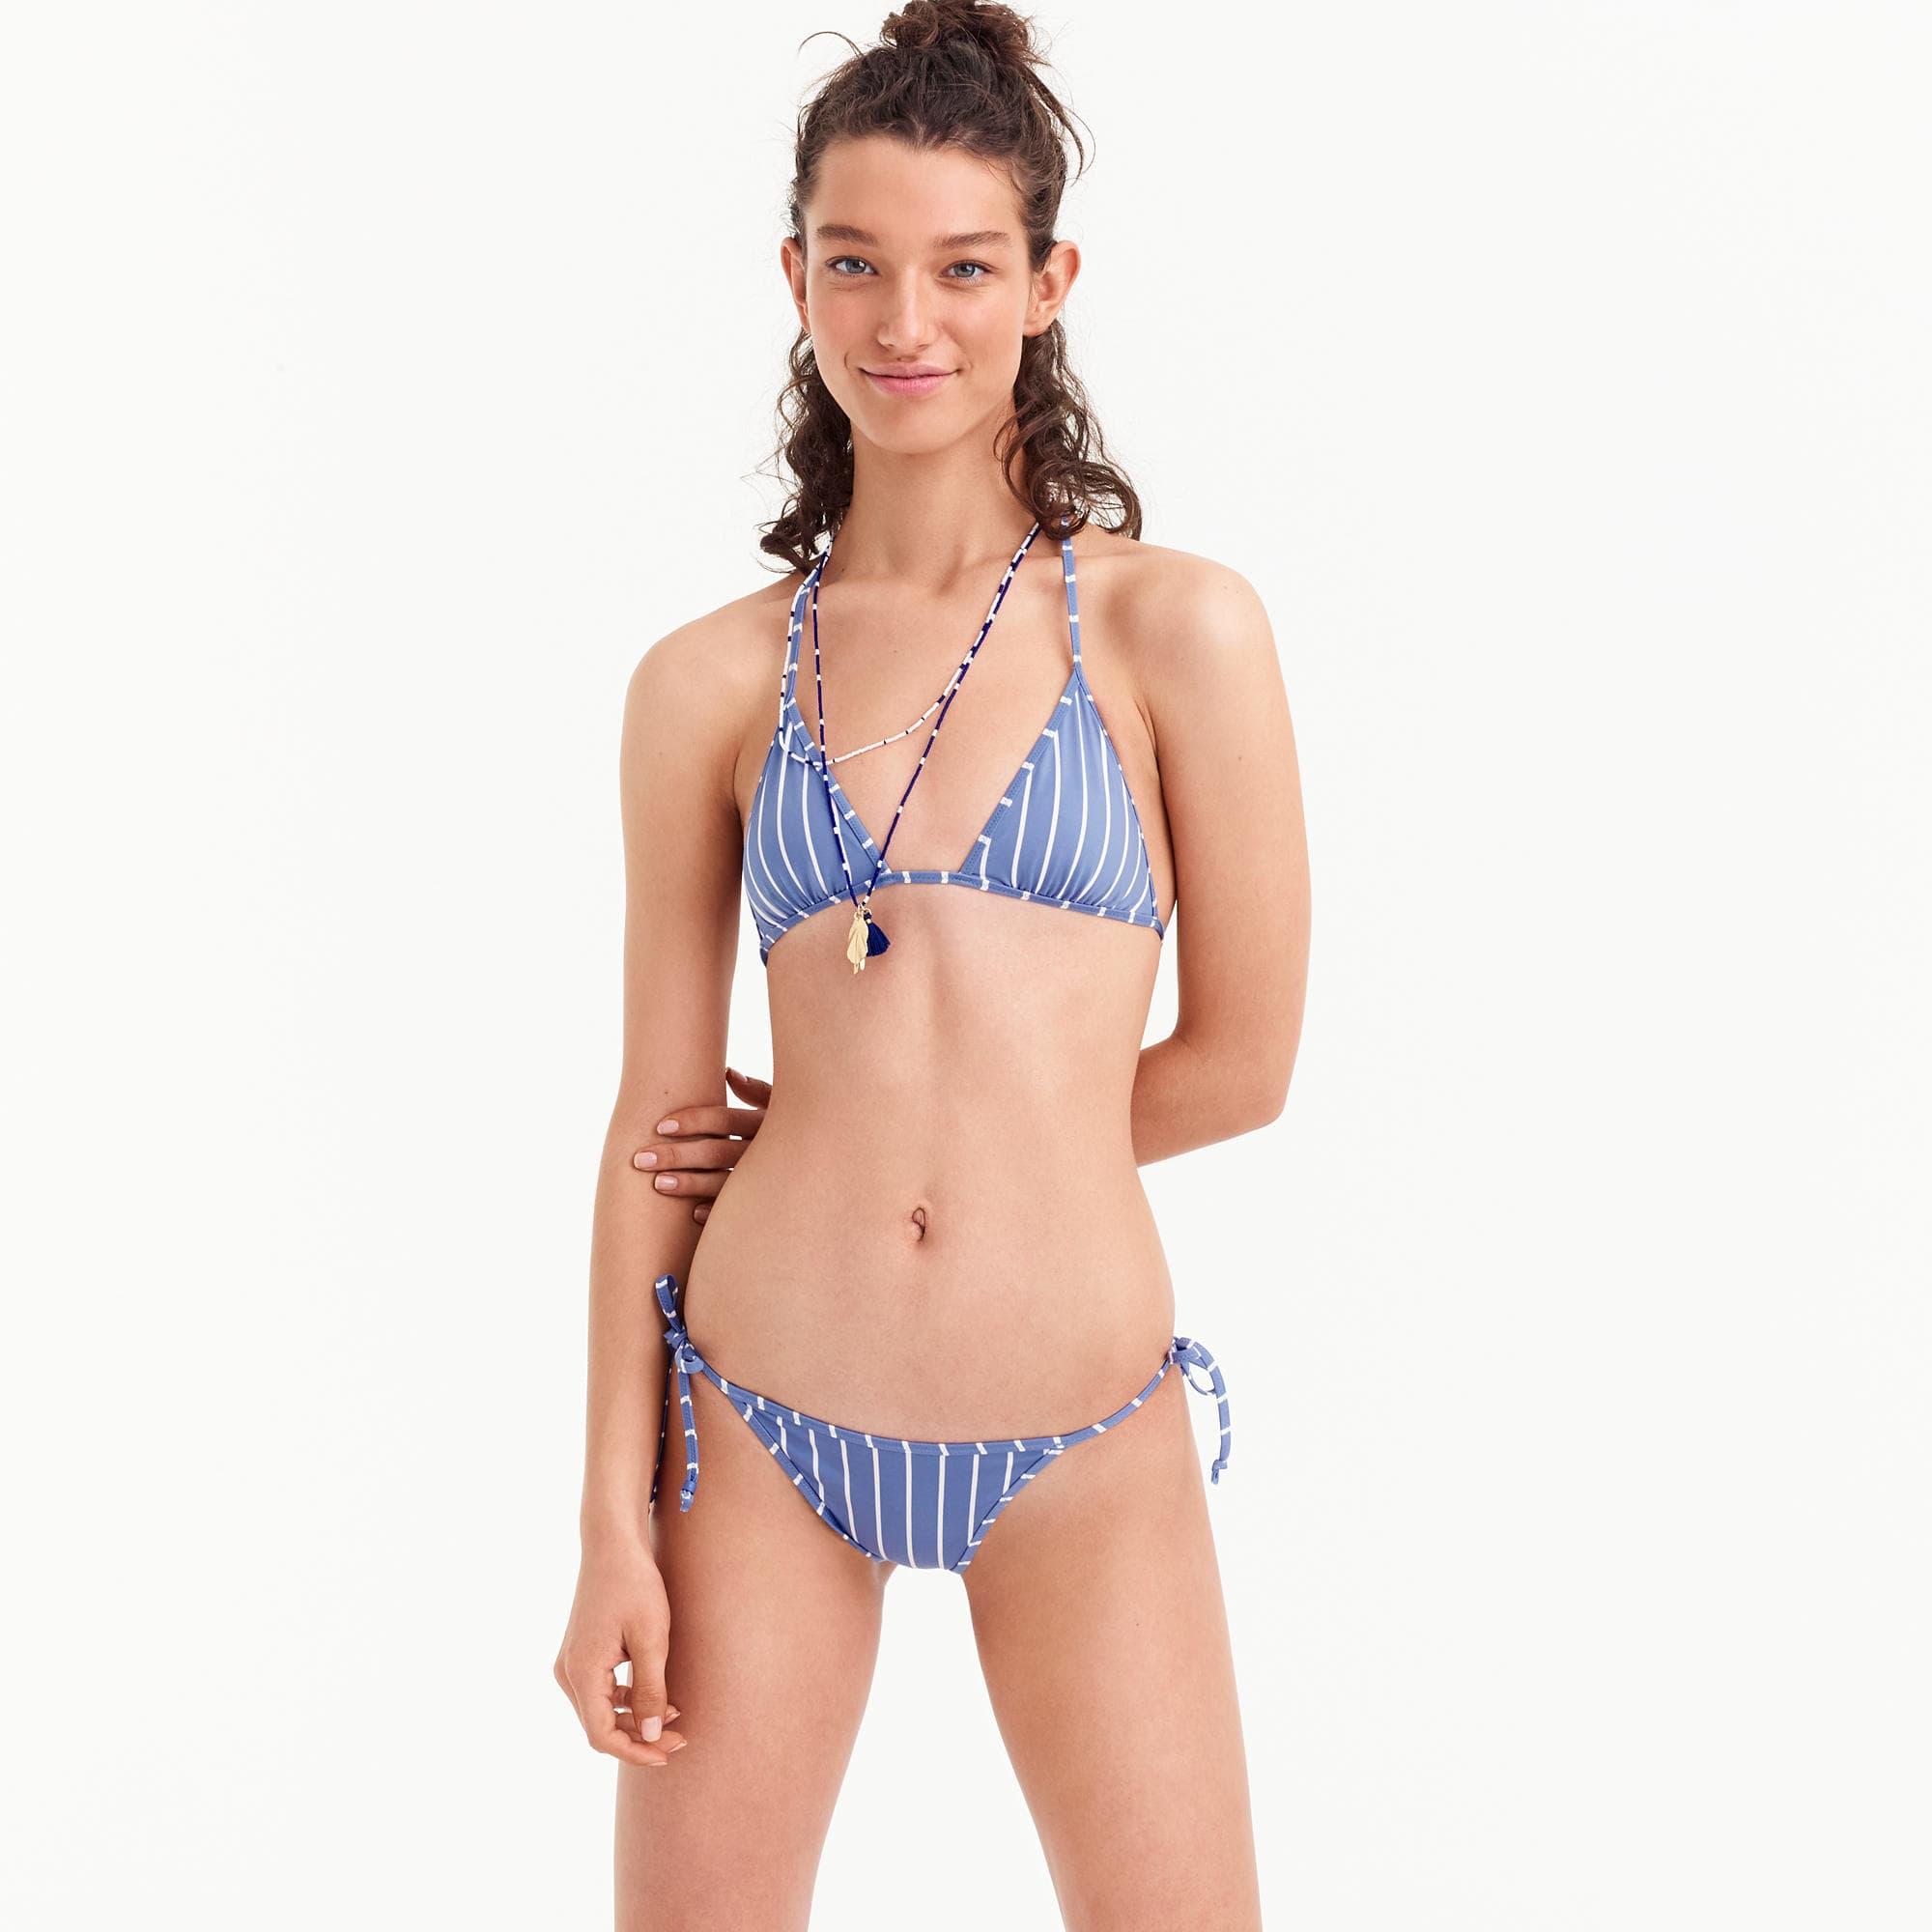 3c99804887d04 J.Crew's New Swimsuit Line Starts at Just $25 - FabFitFun